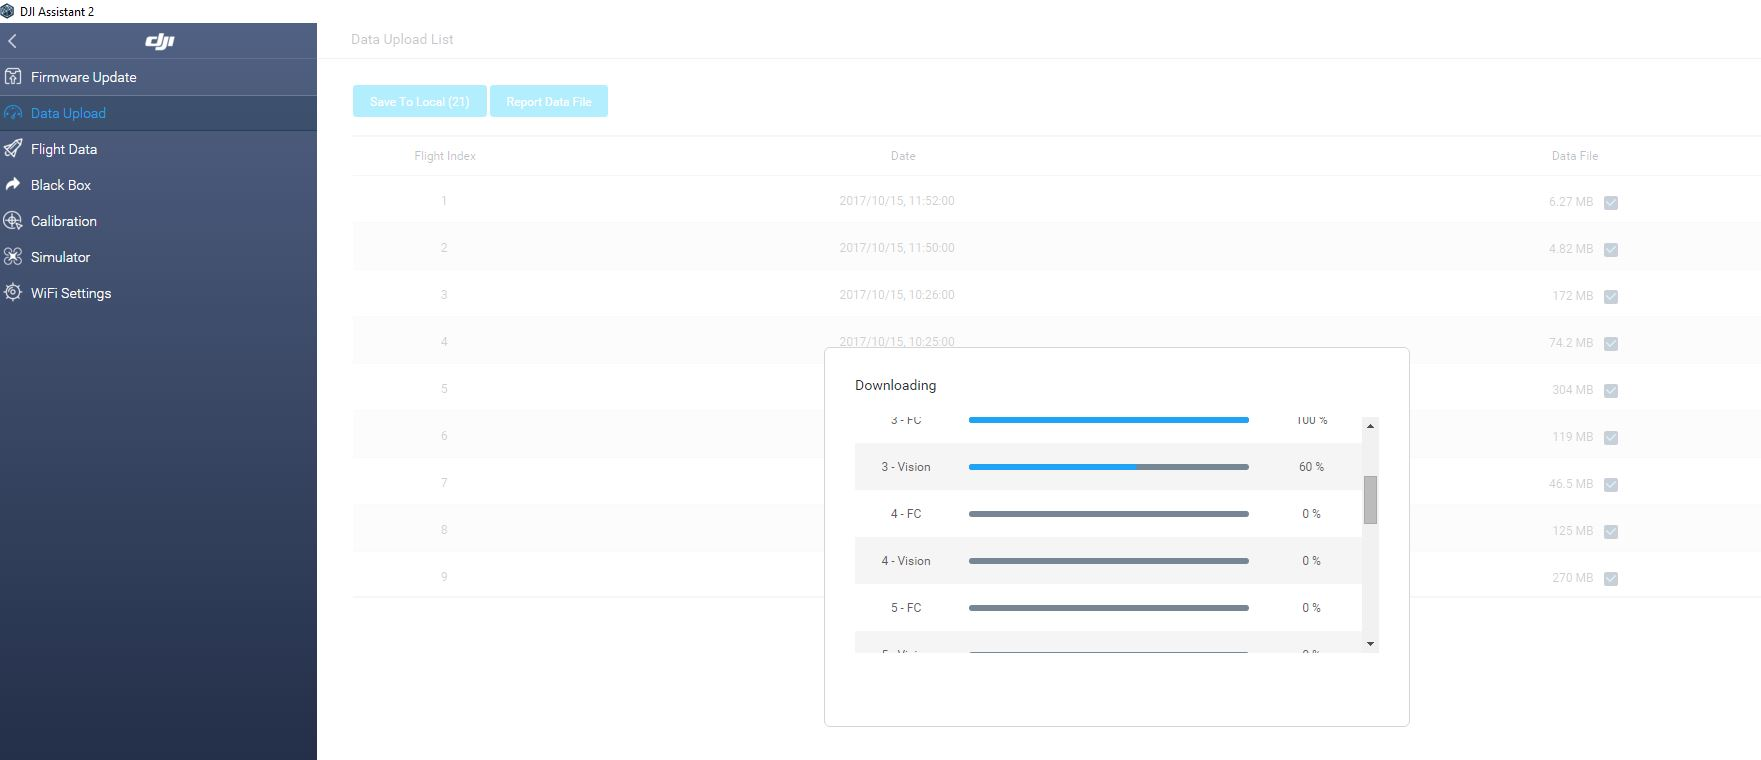 DJI Assistant 2 Mavic Data Upload